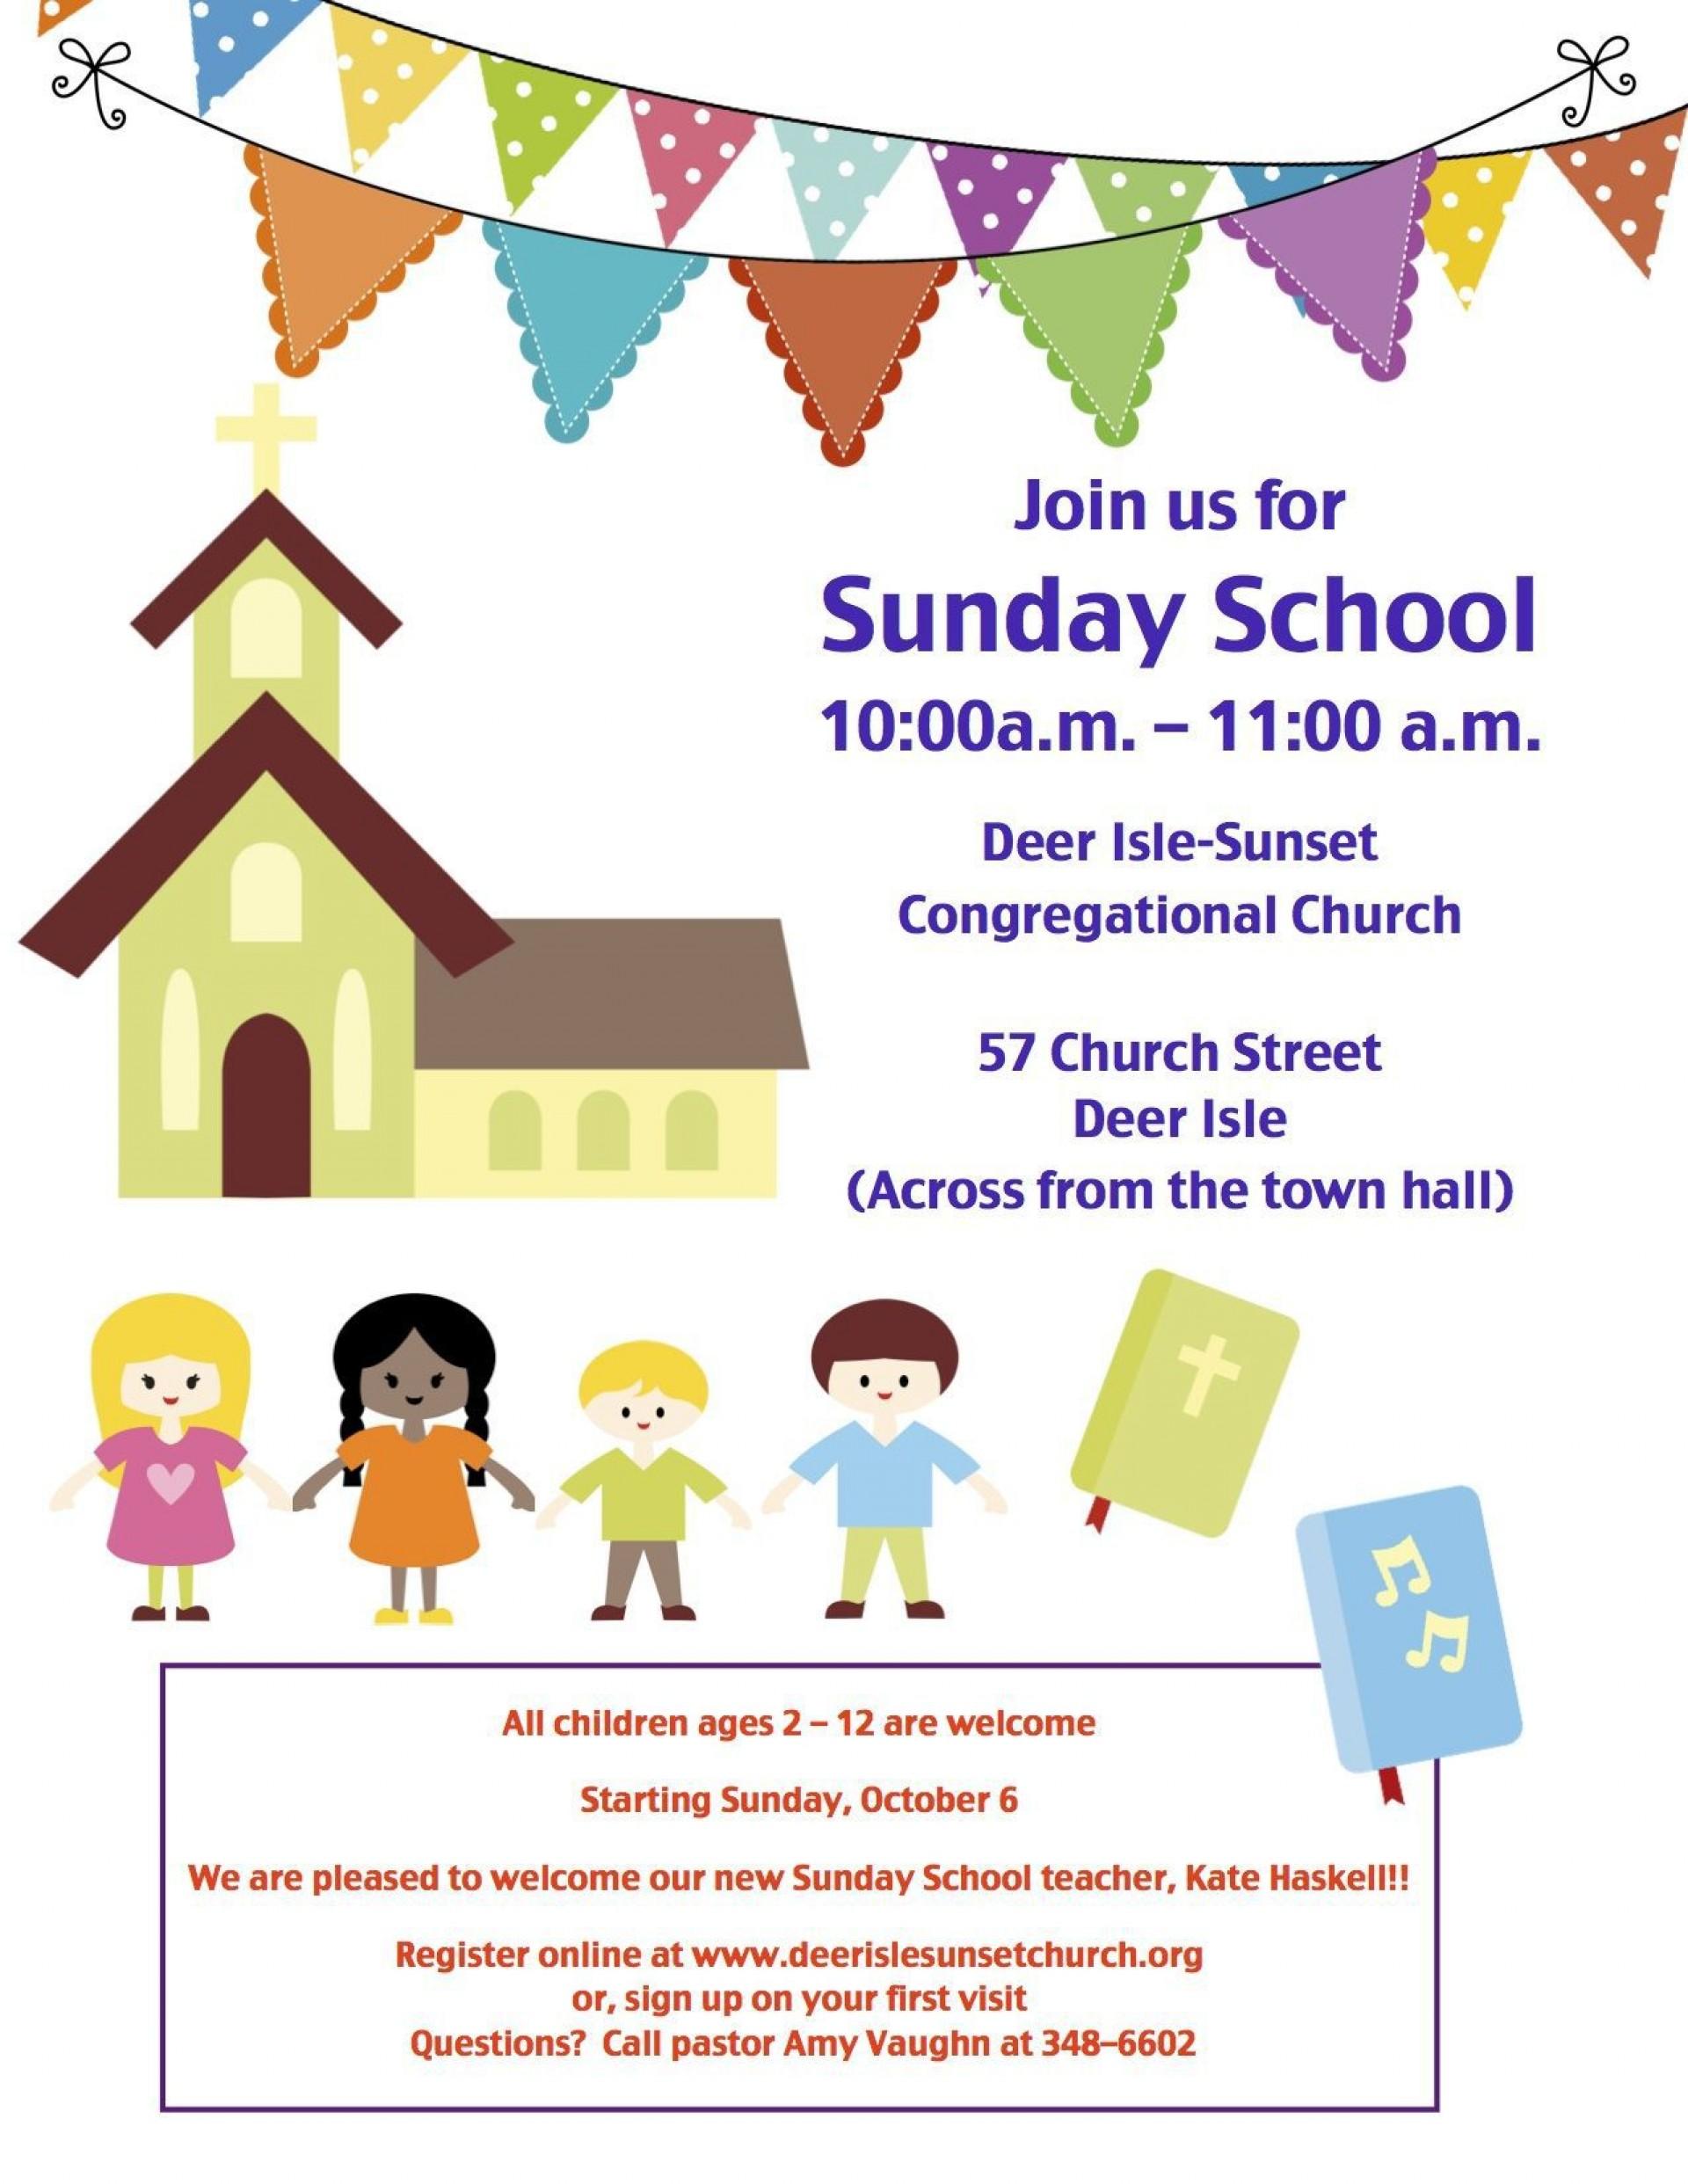 001 Unique Free Sunday School Flyer Template Photo  Templates1920